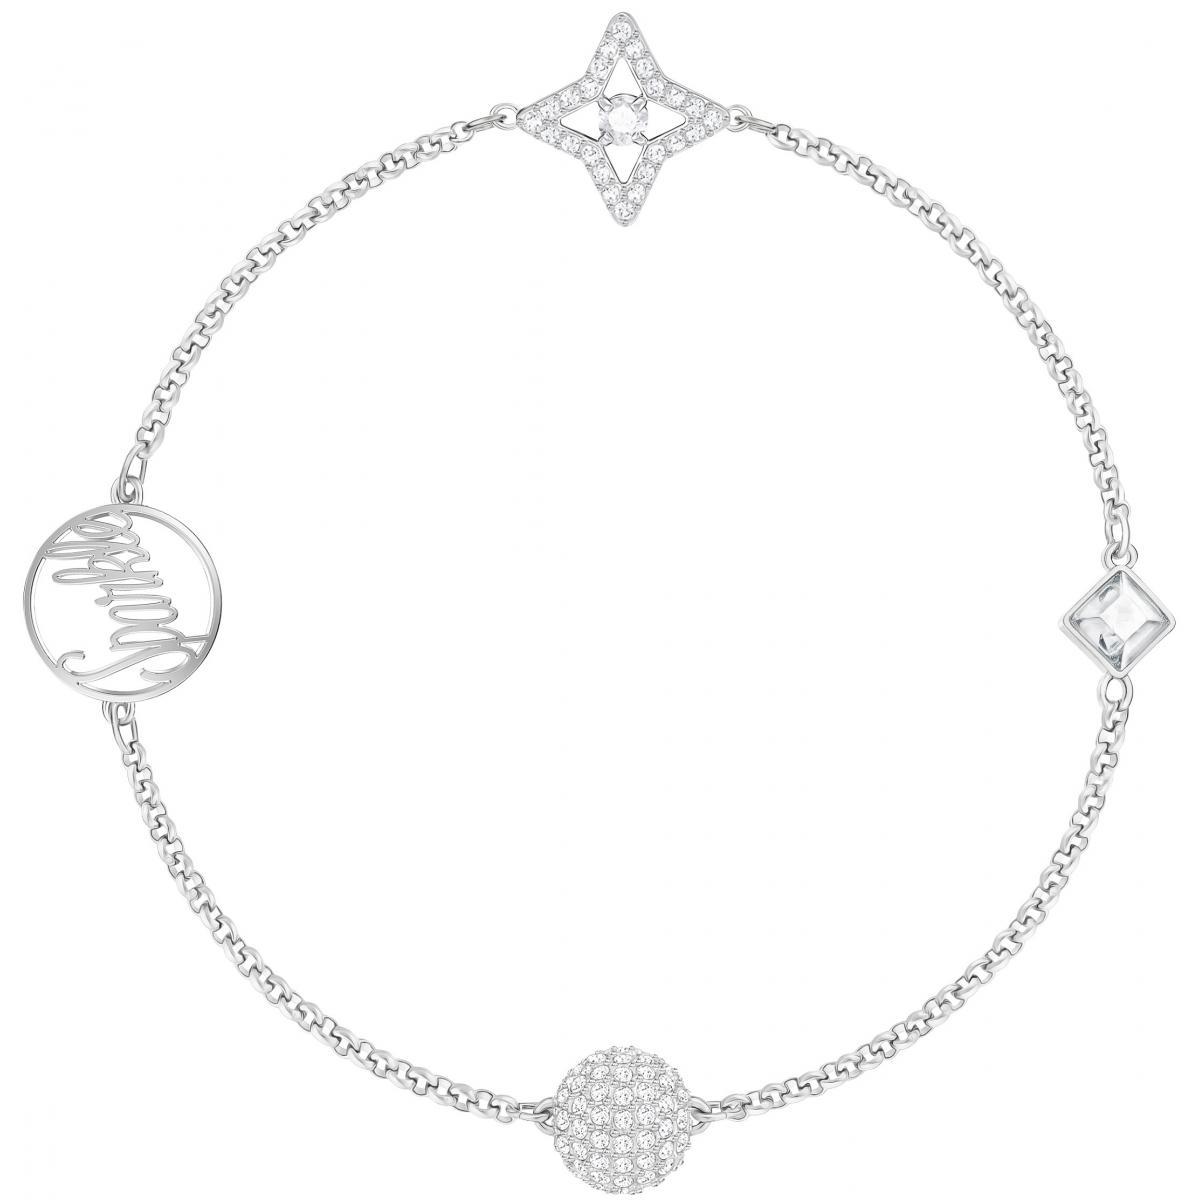 Bracelet Swarovski Remix 5365752 - Bracelet Remix Strandage Star Femme